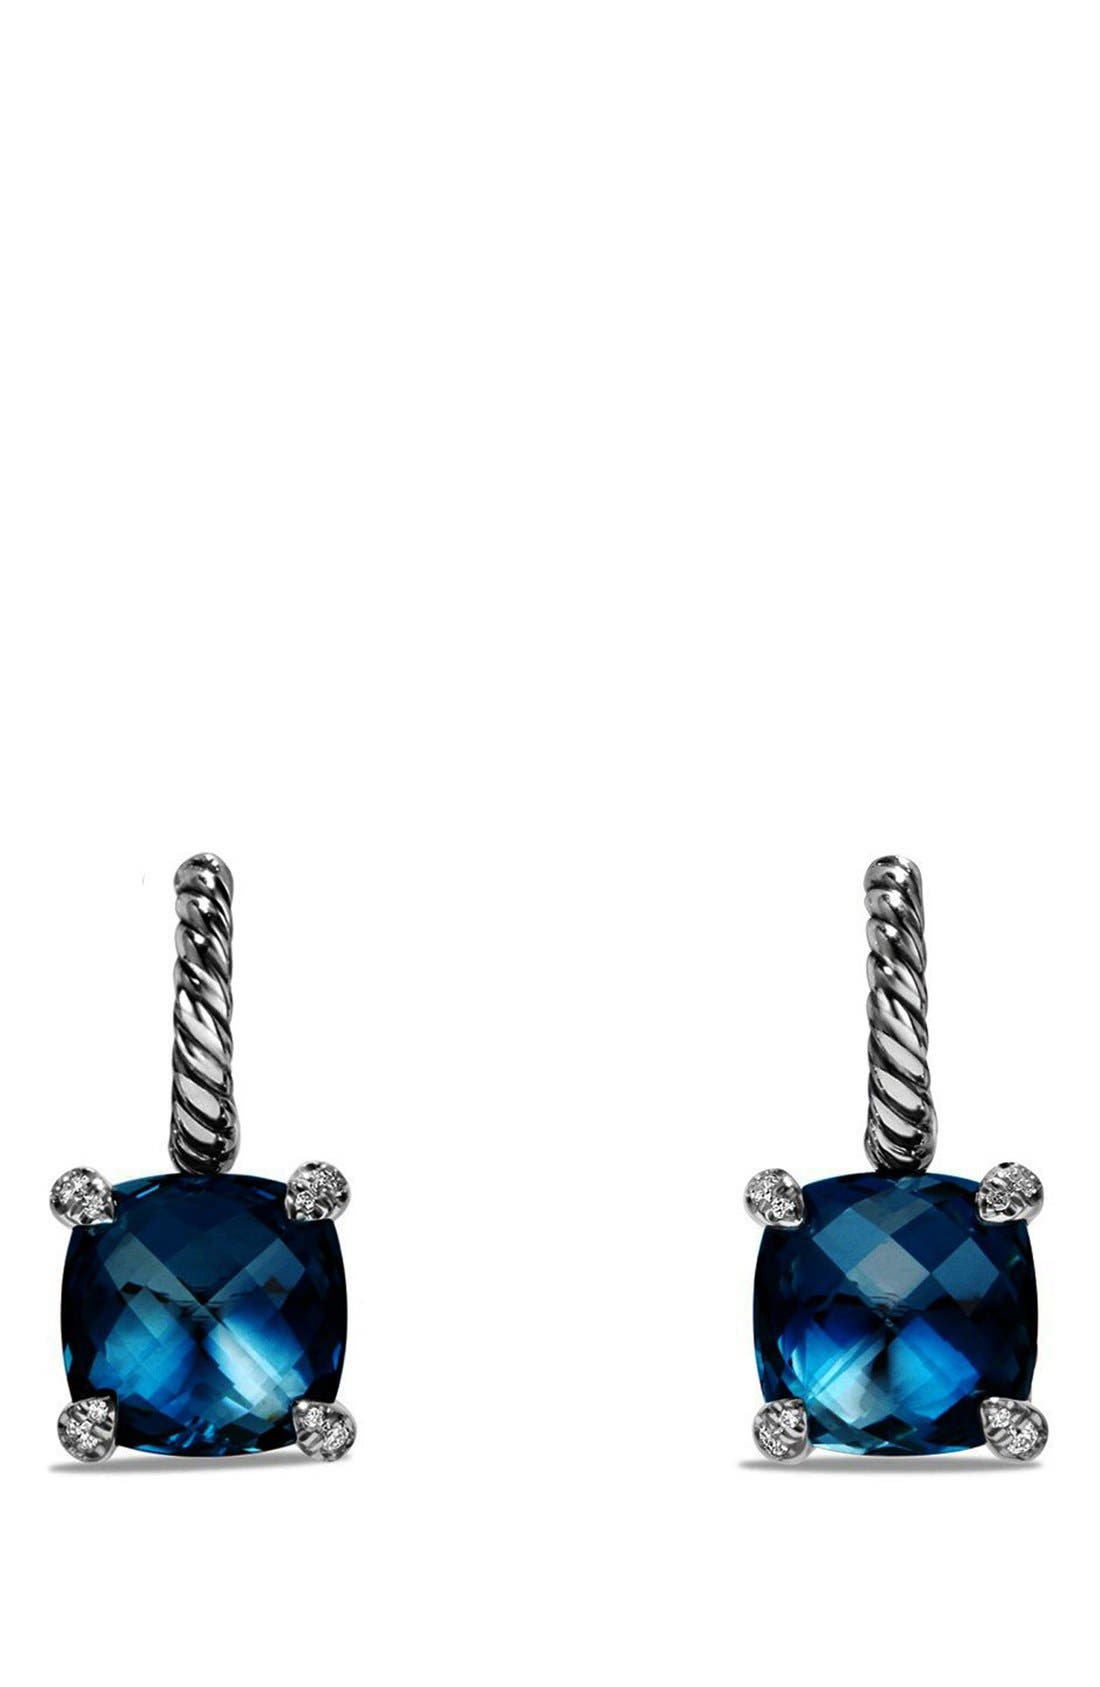 DAVID YURMAN Châtelaine Drop Earrings with Semiprecious Stones and Diamonds